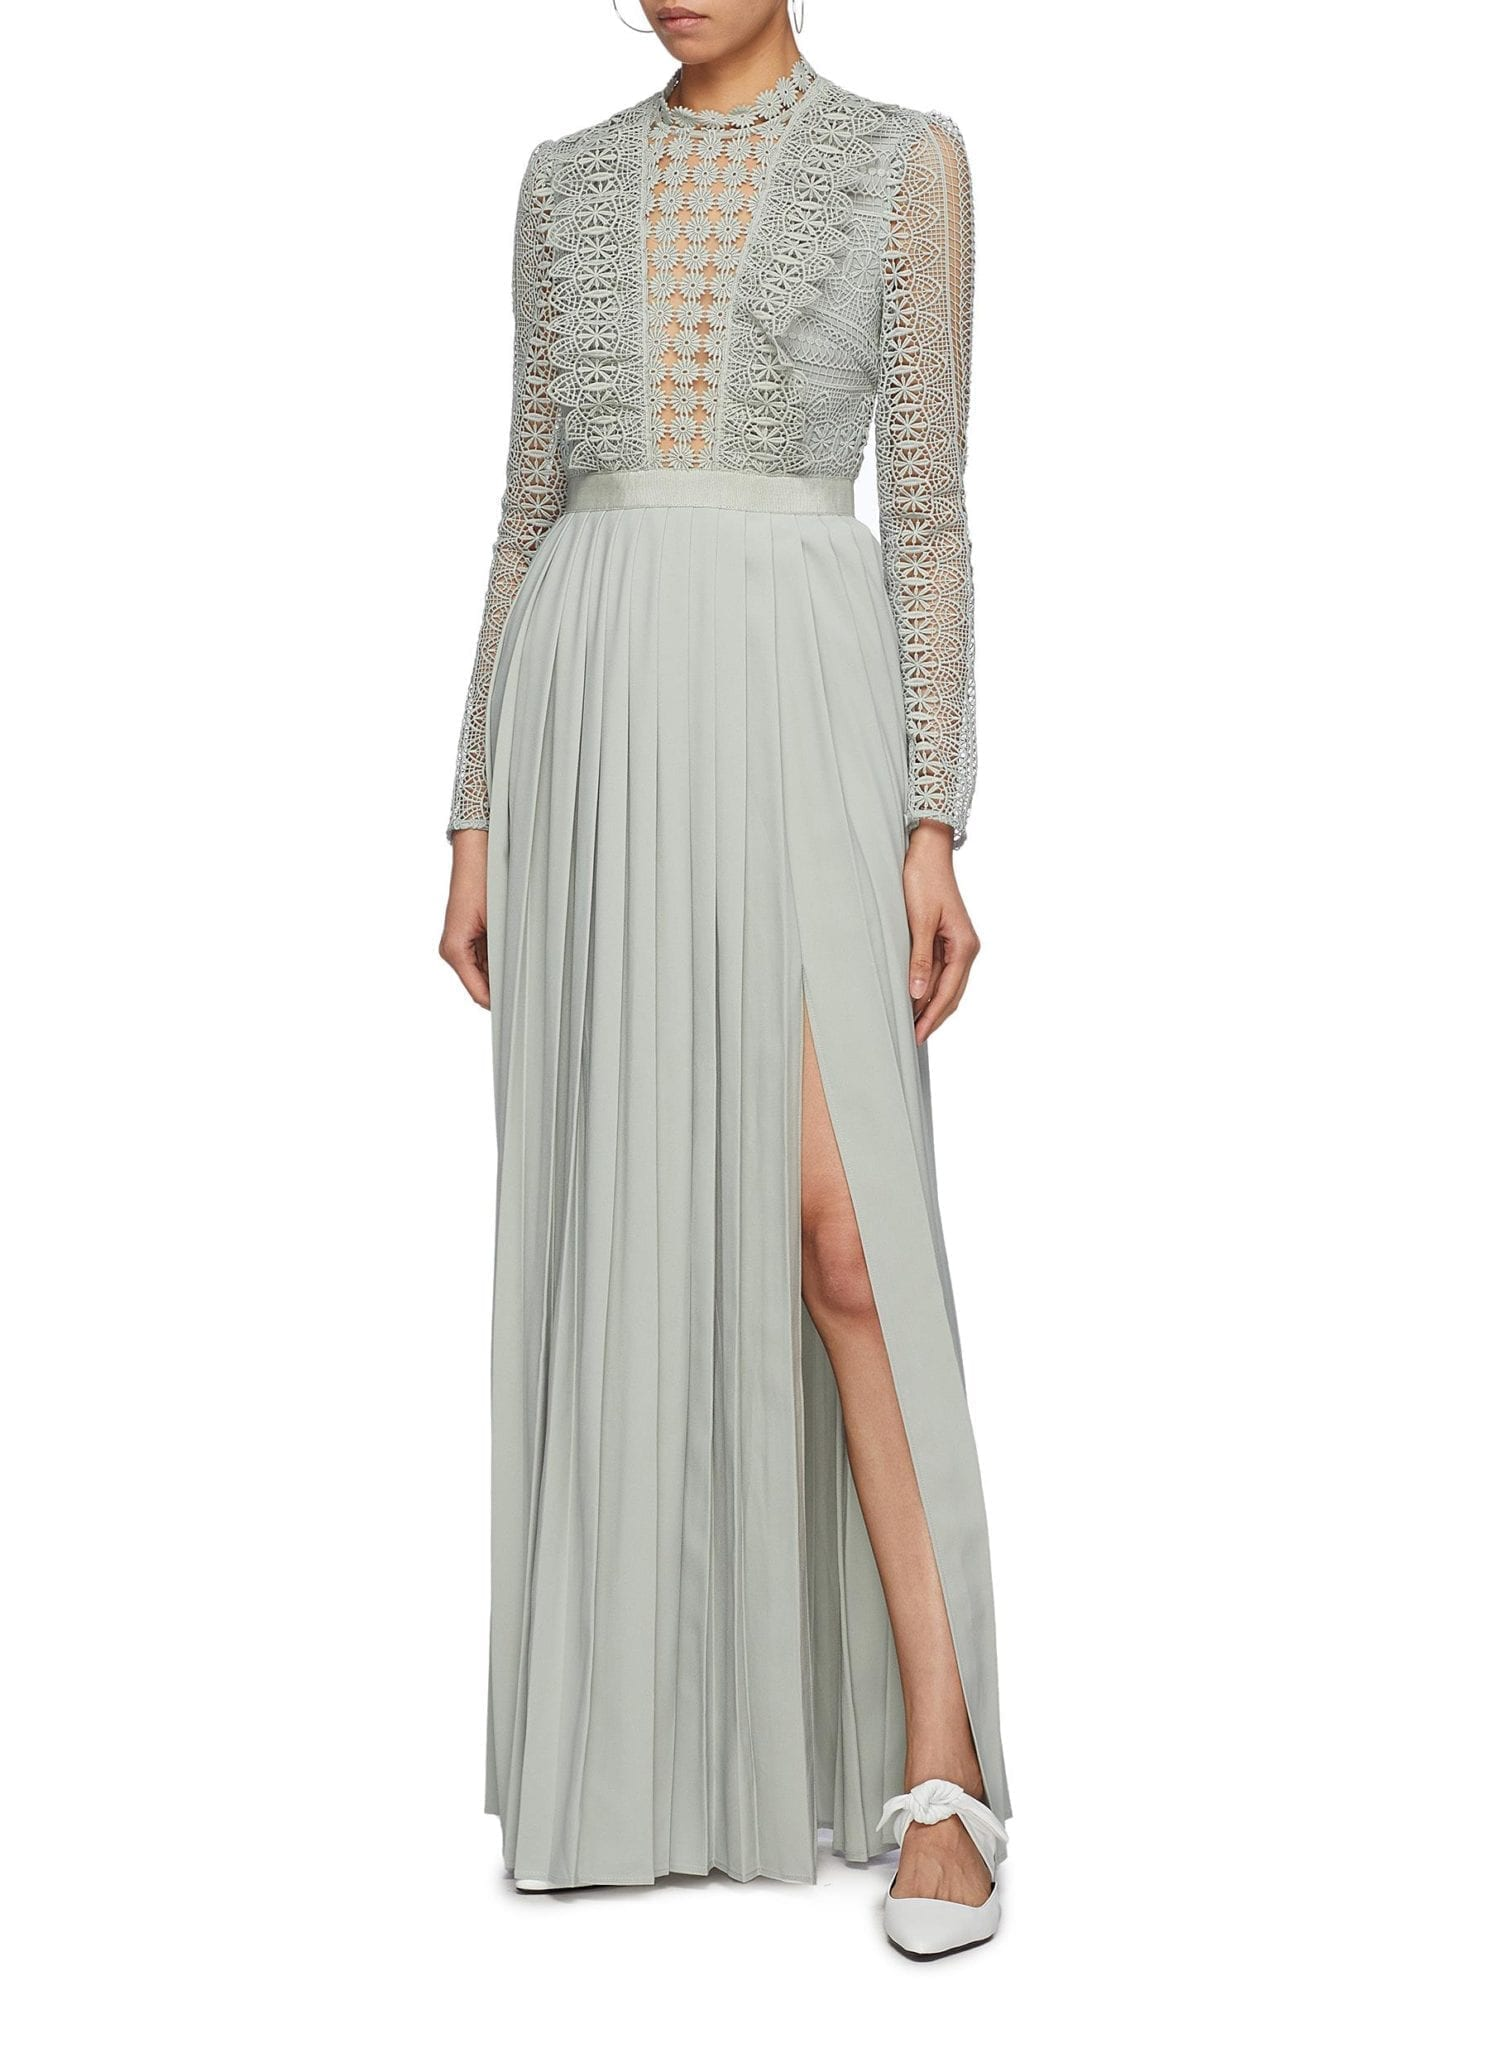 SELF-PORTRAIT Guipure Lace Panel Pleated Ice Blue Dress